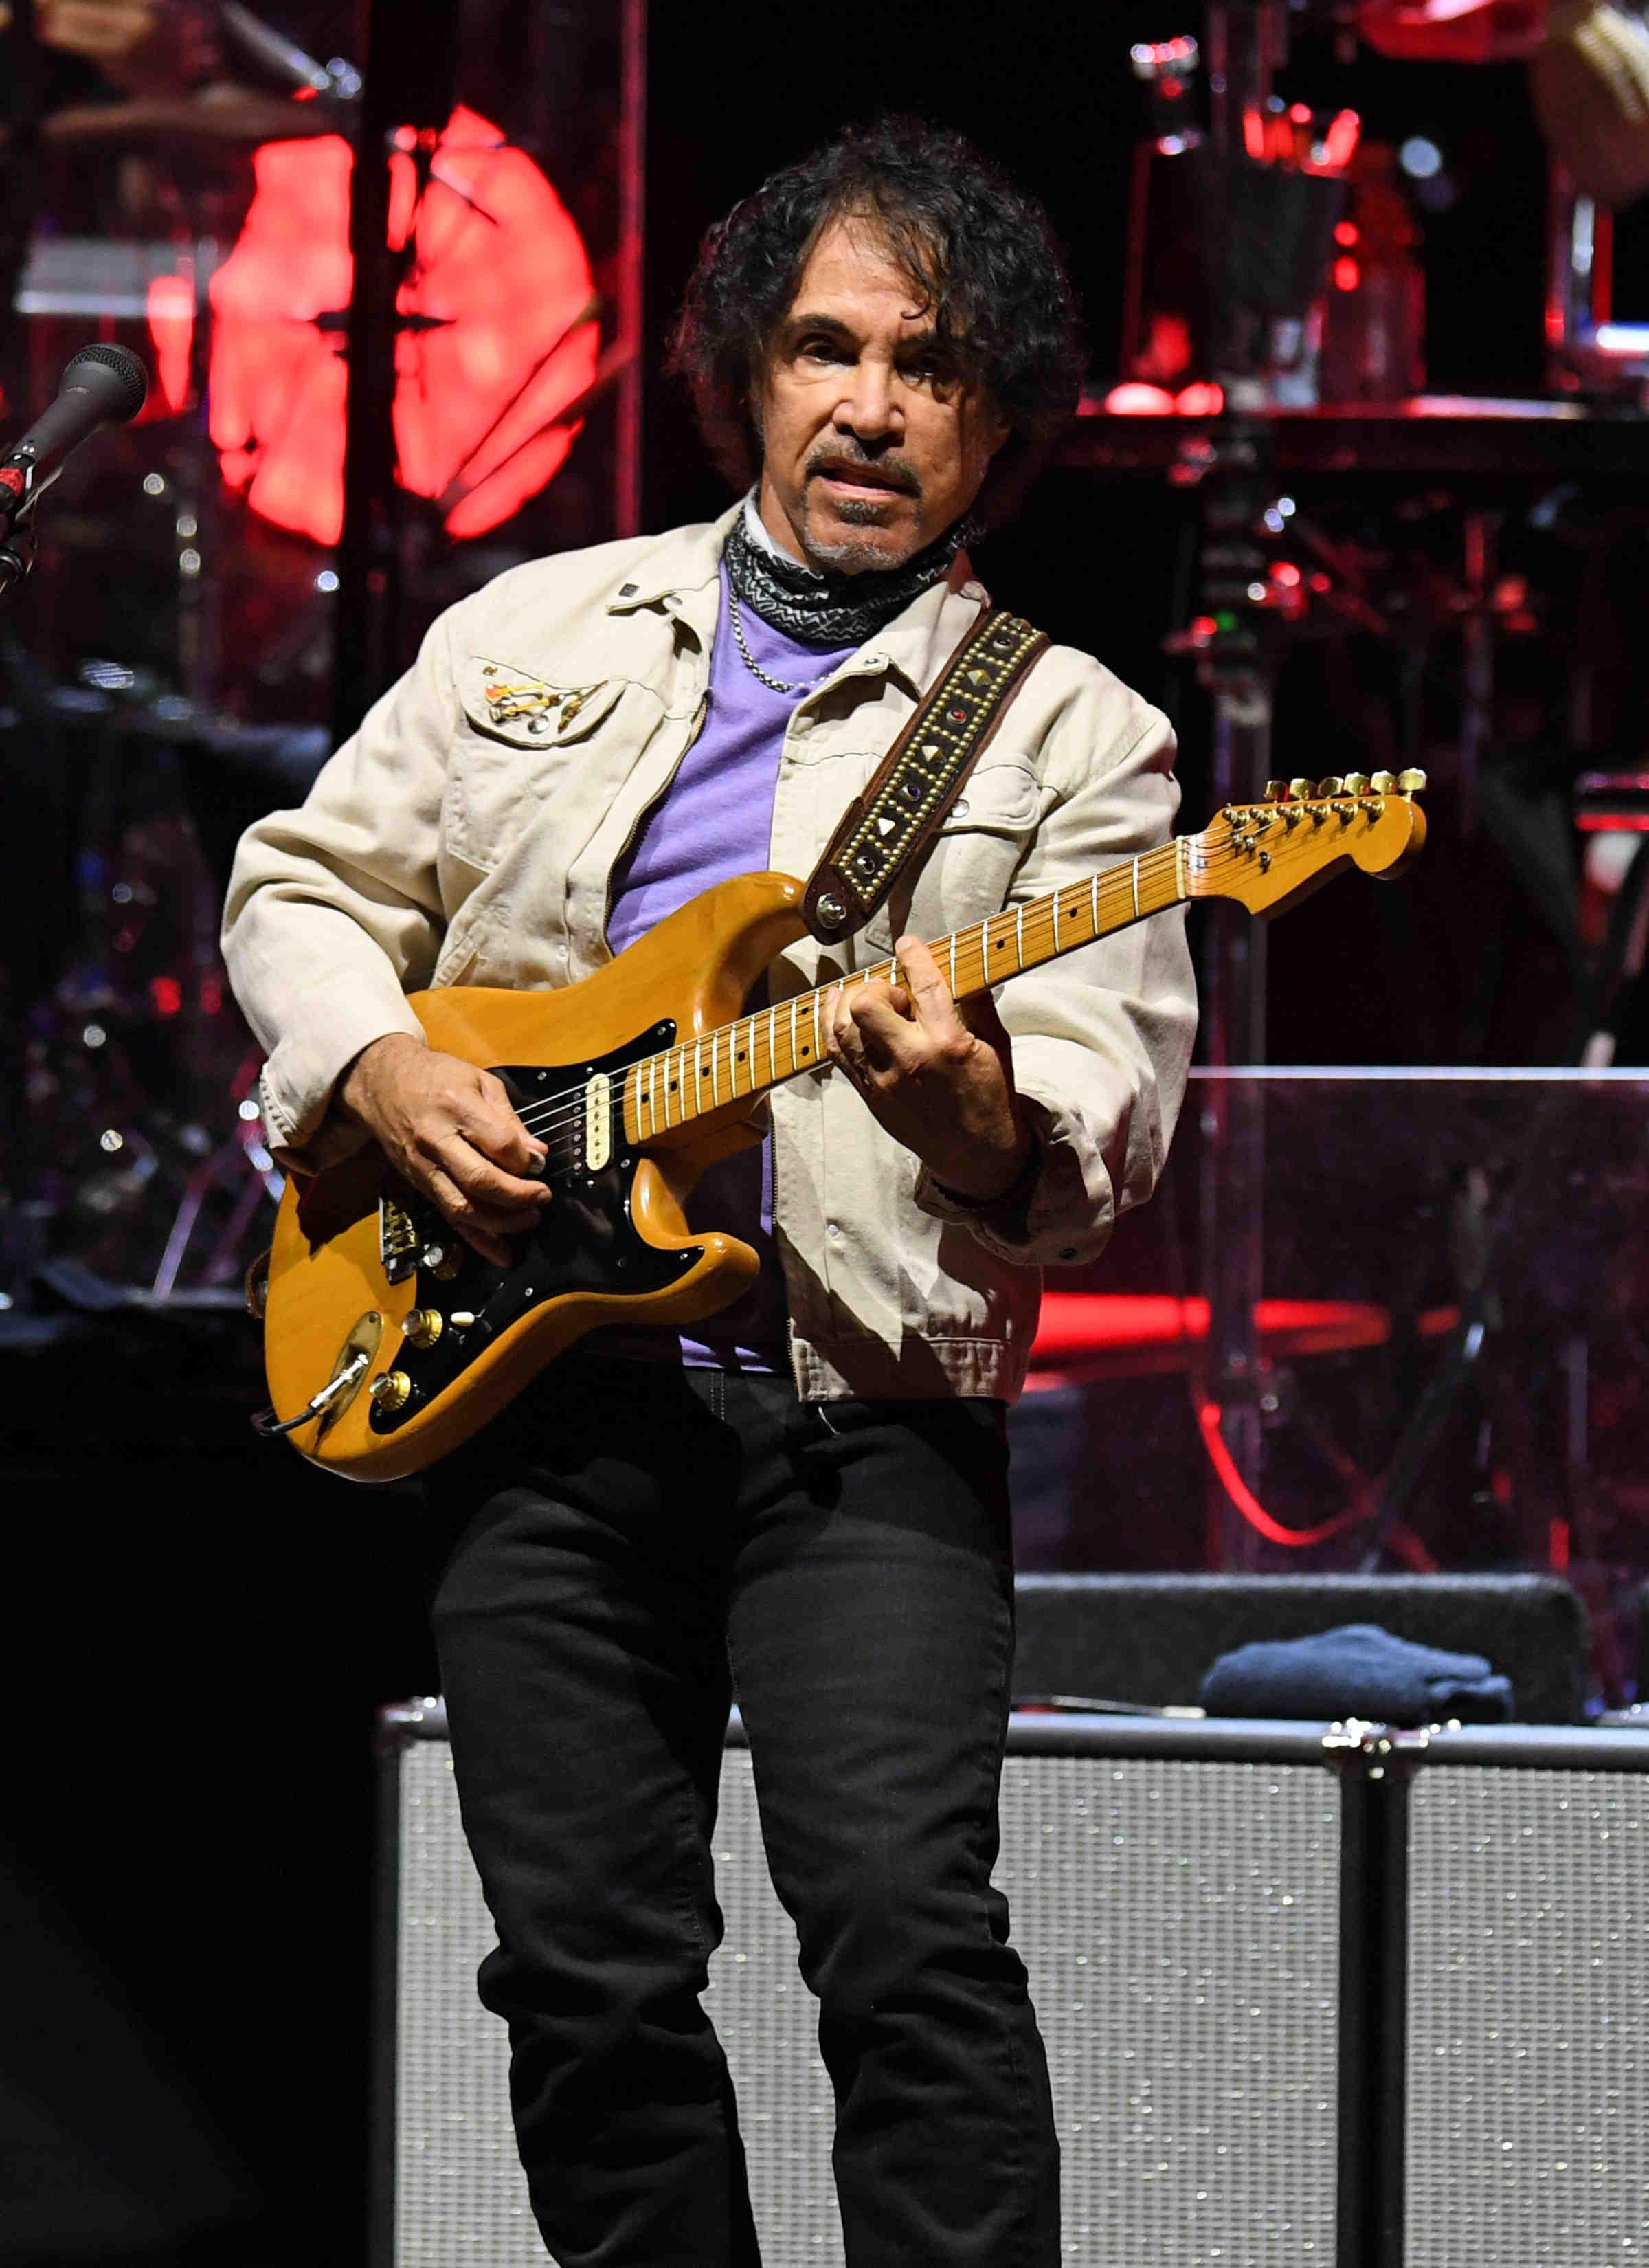 John Oates performs at Seminole Hard Rock Hotel & Casino.